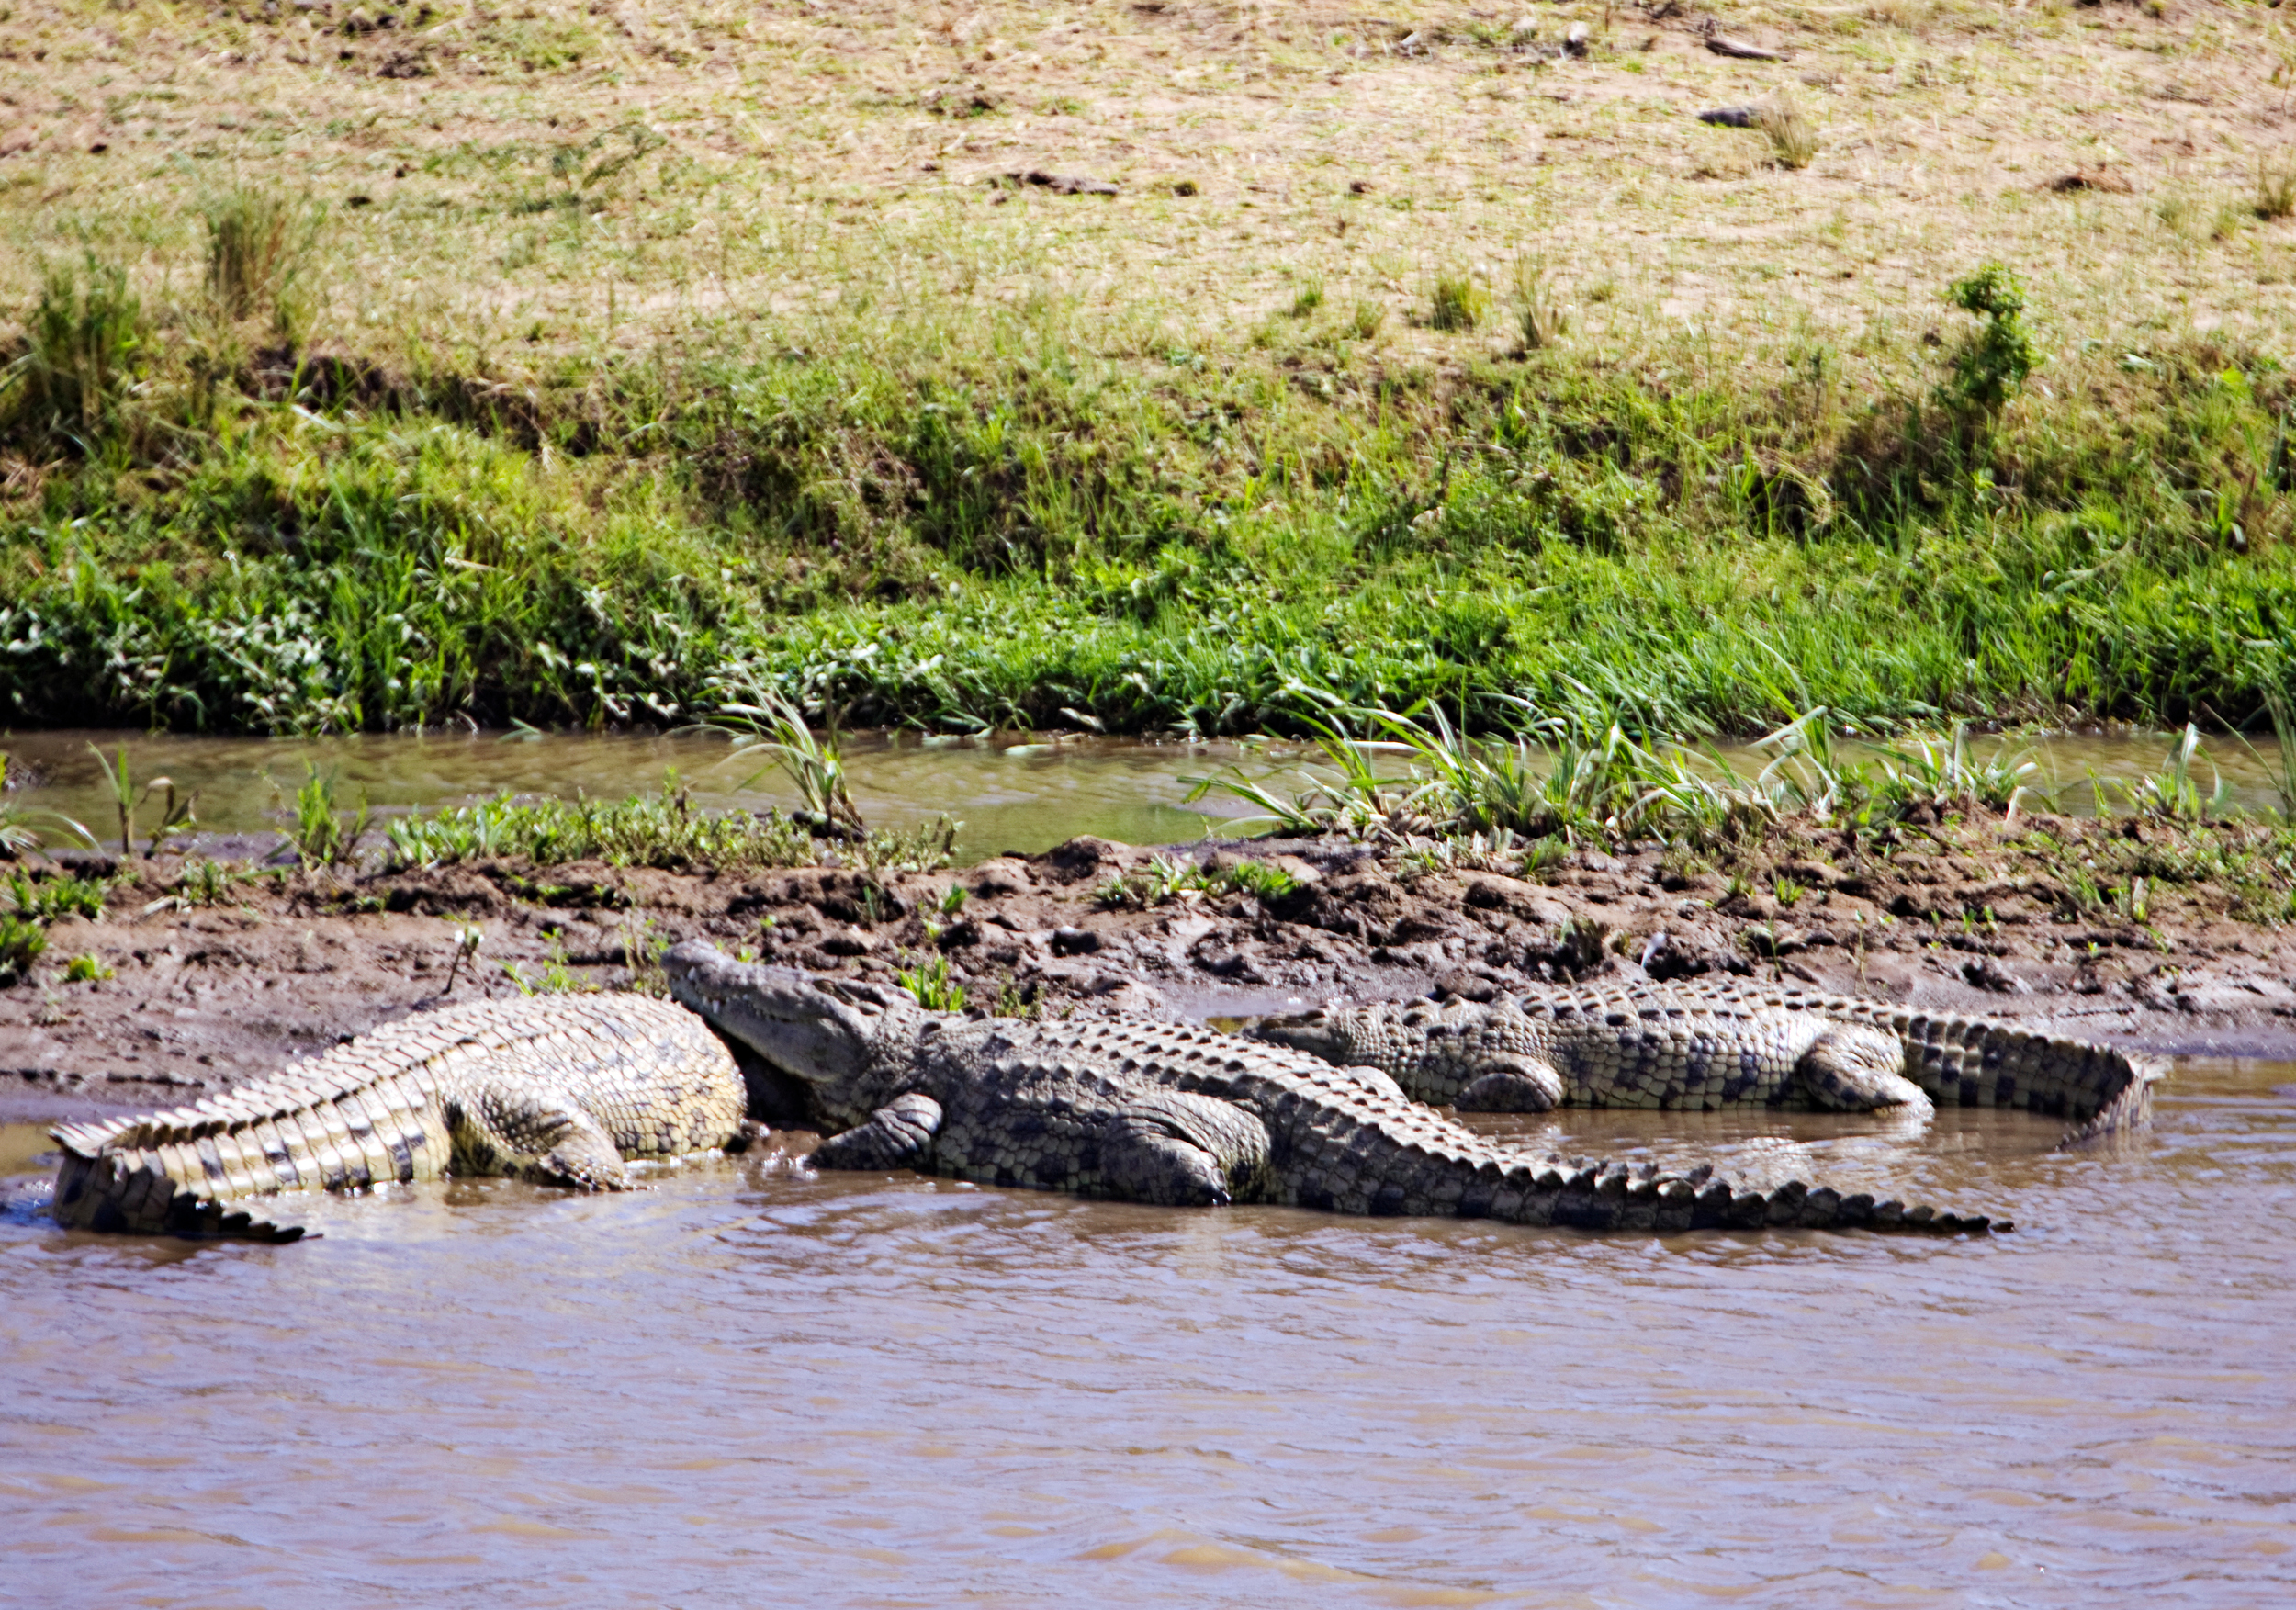 Crocodiles, Mara River, Masai Mara